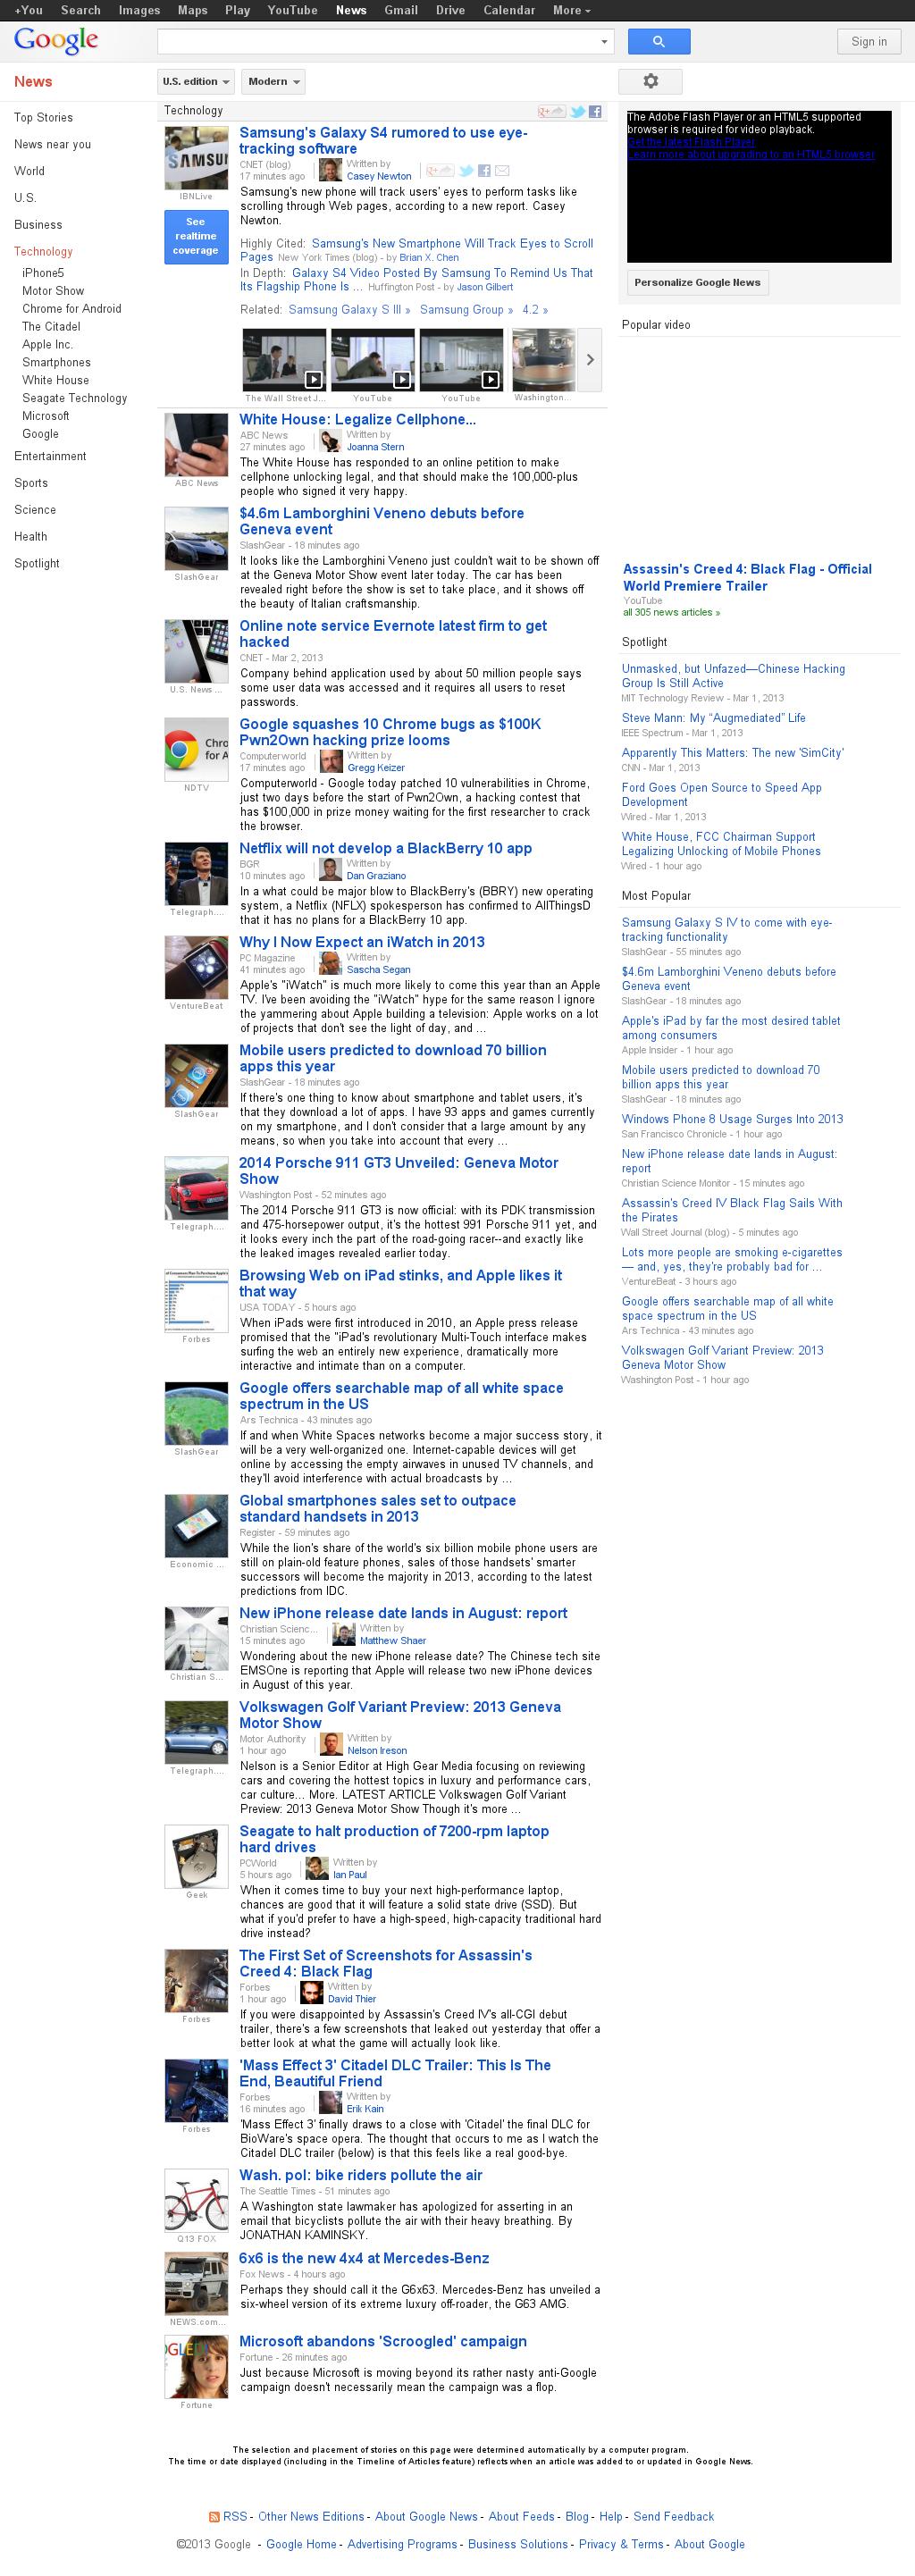 Google News: Technology at Monday March 4, 2013, 9:07 p.m. UTC